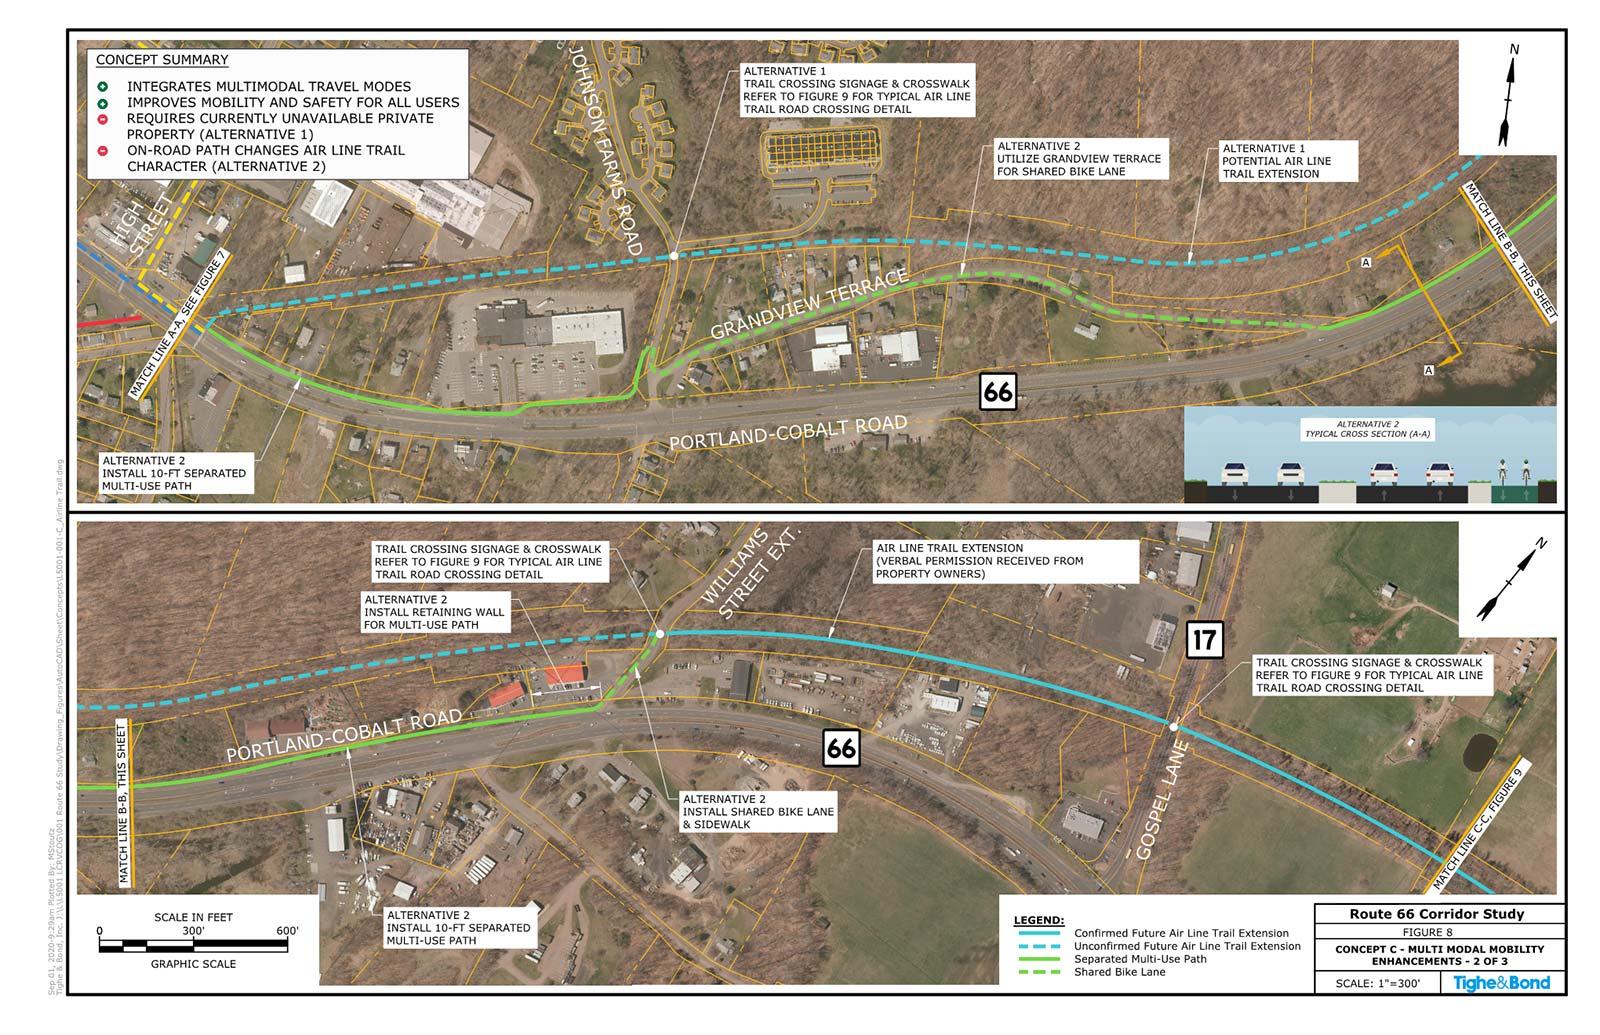 Multi-Modal Mobility Enhancements (Concept C). Route 66 Transportation Study, Portland and East Hampton, CT.